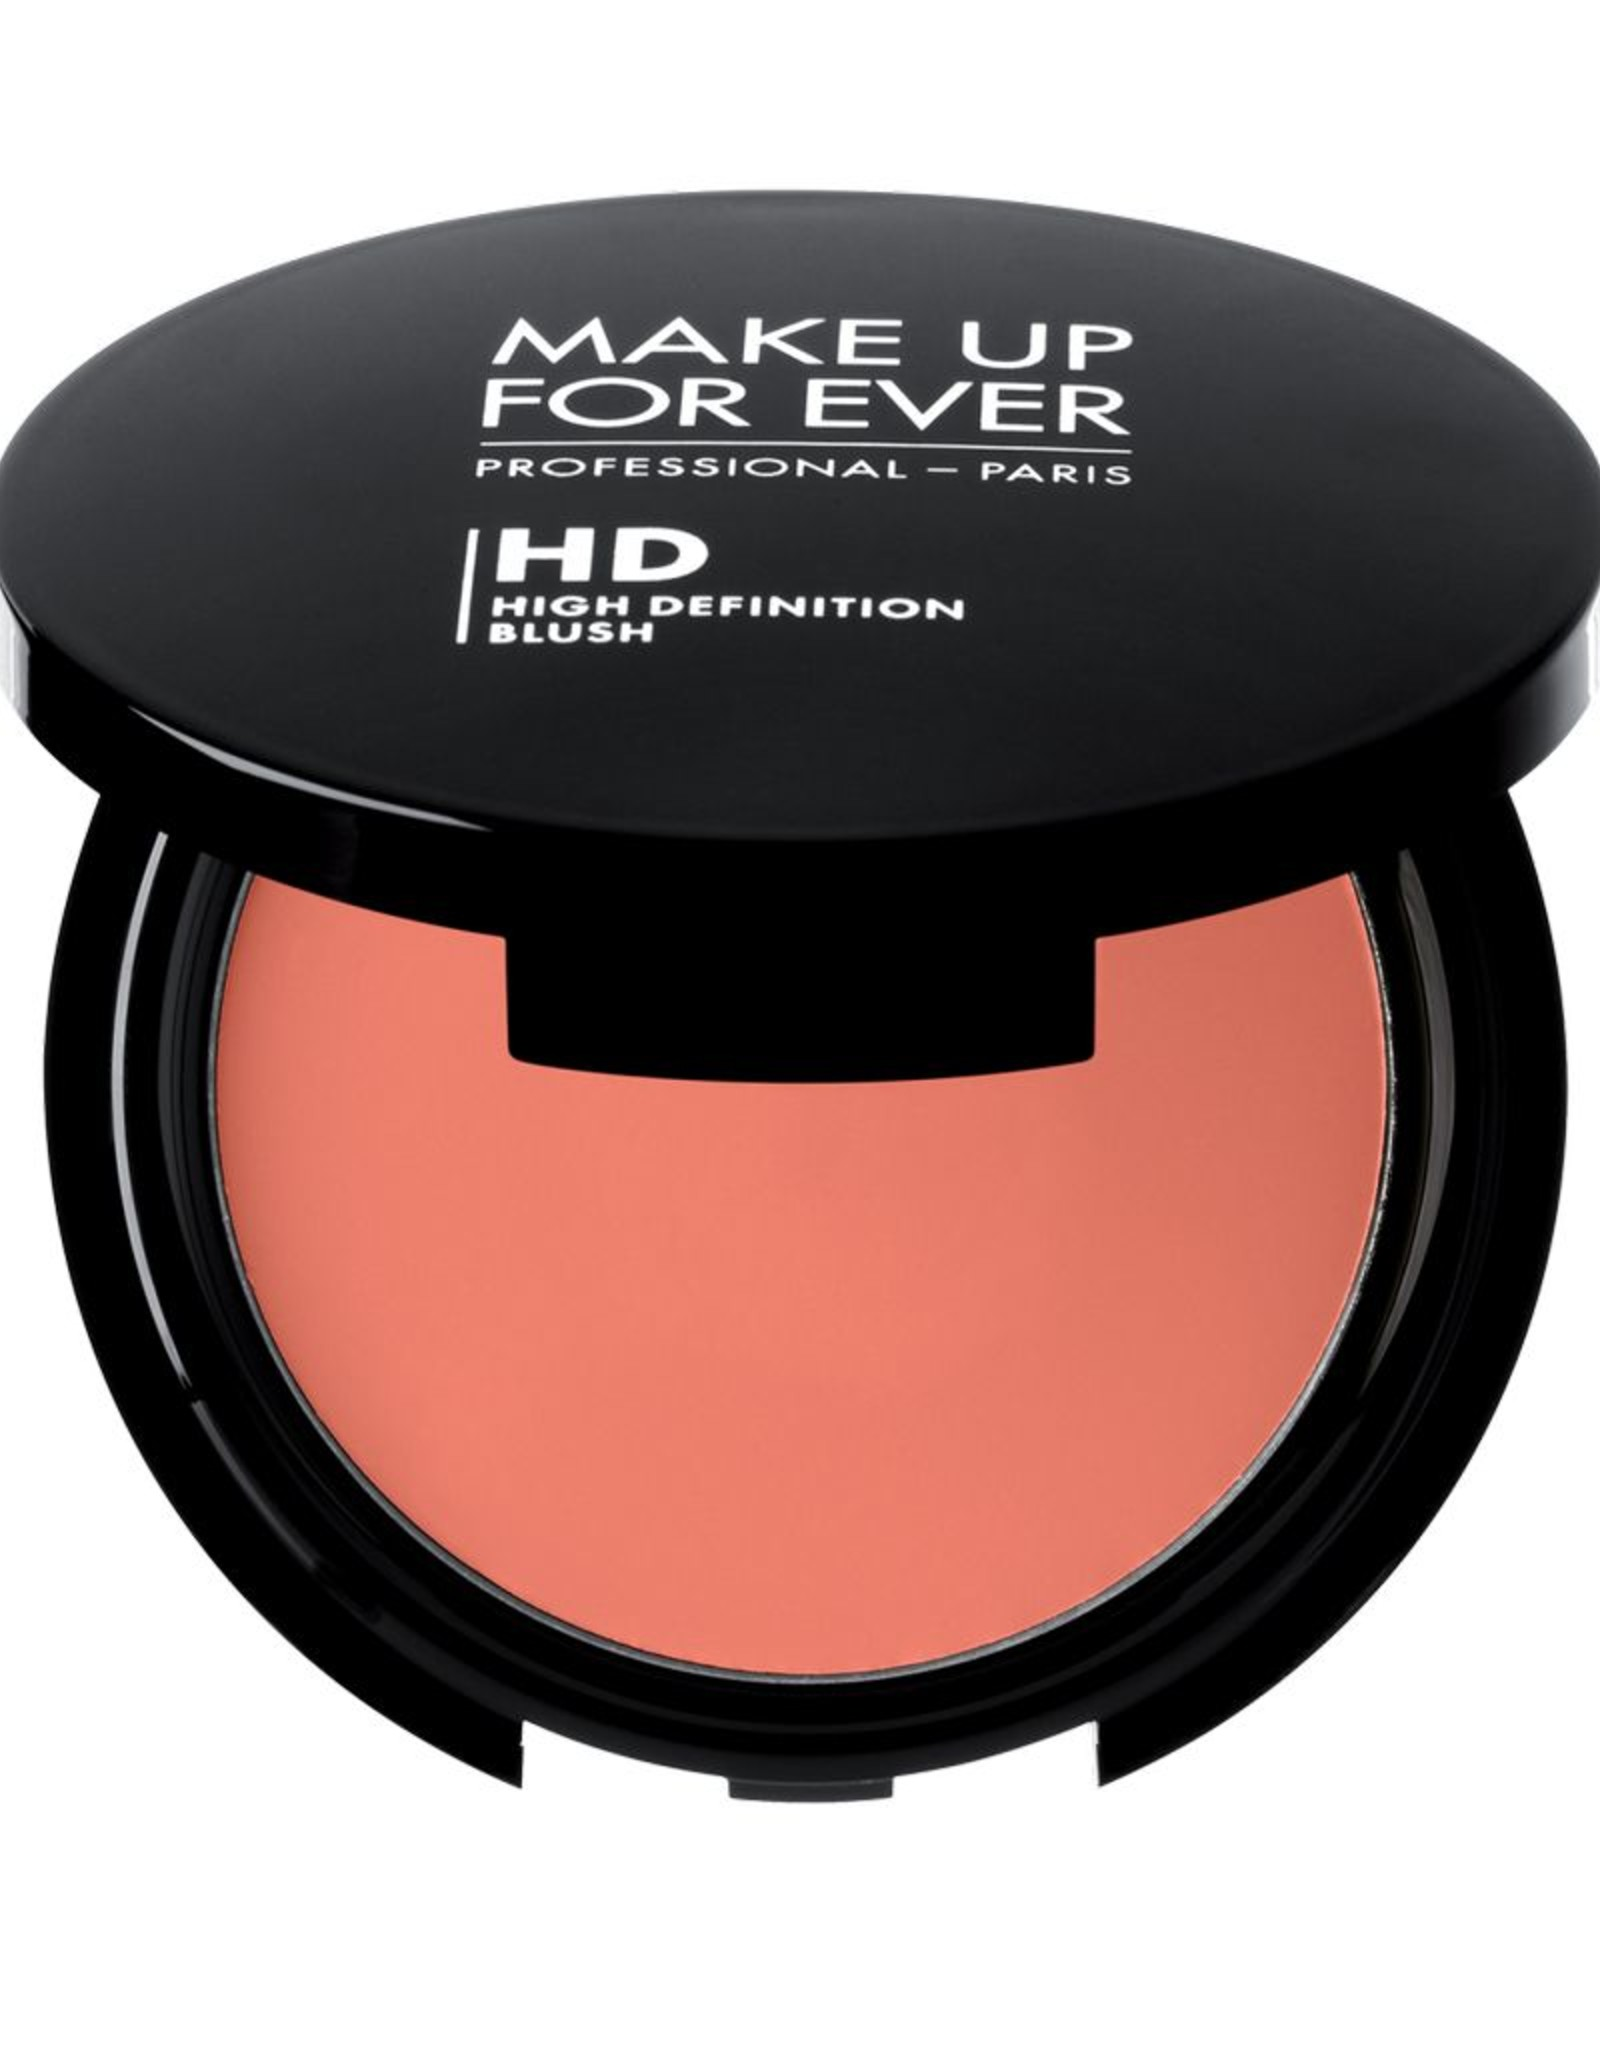 MUFE HD BLUSH CREME 2.8G #225: Peachy Pink